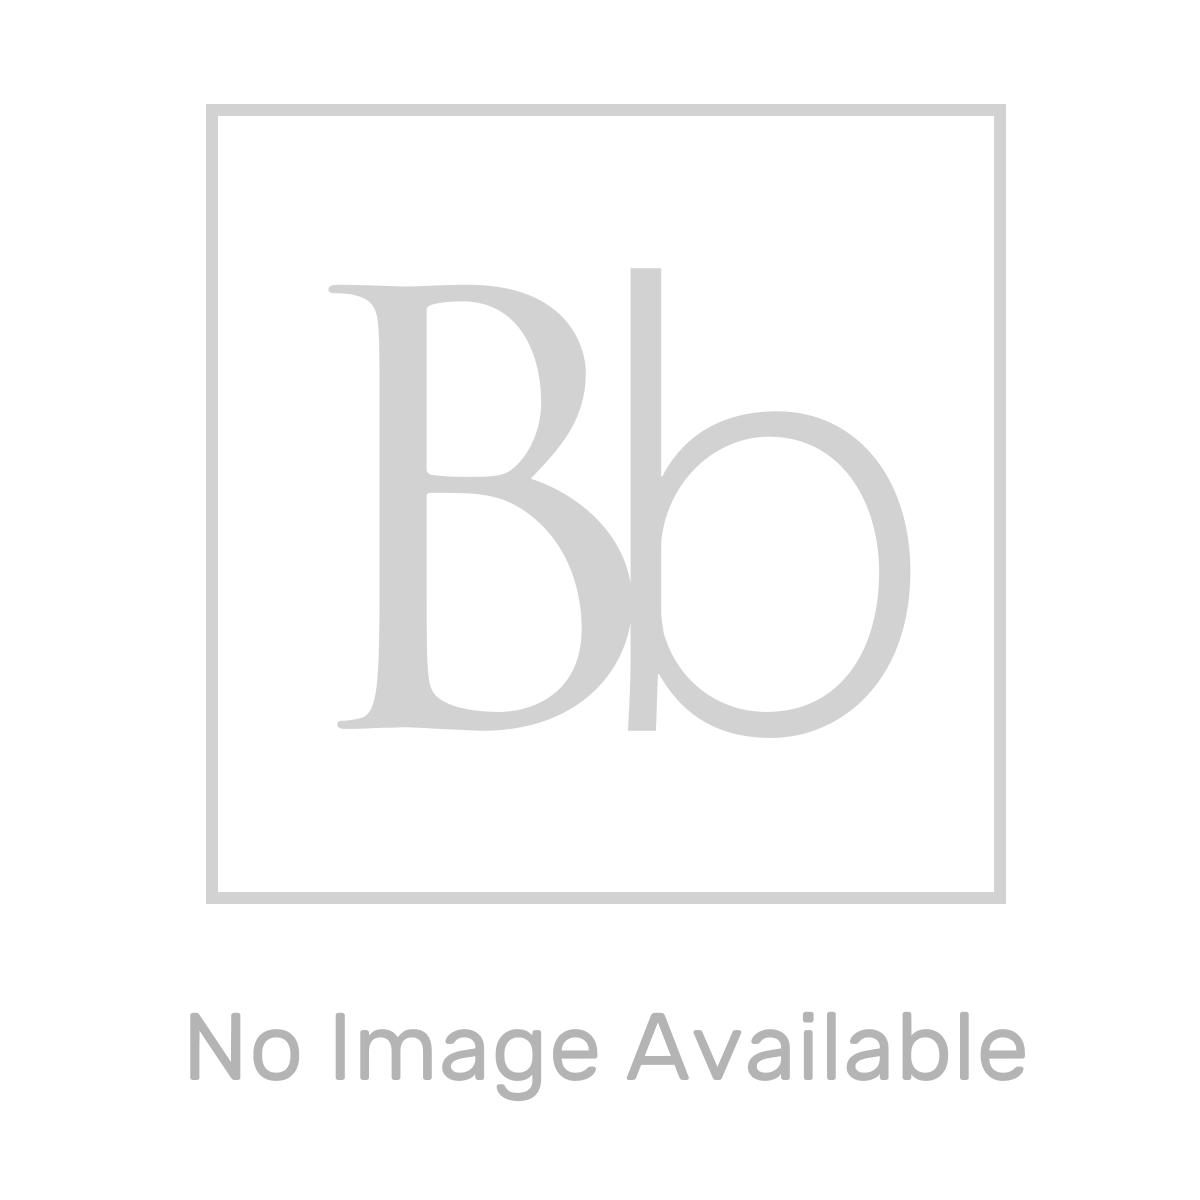 Nuie Windon Chrome Square Triple Thermostatic Valve Dimensions